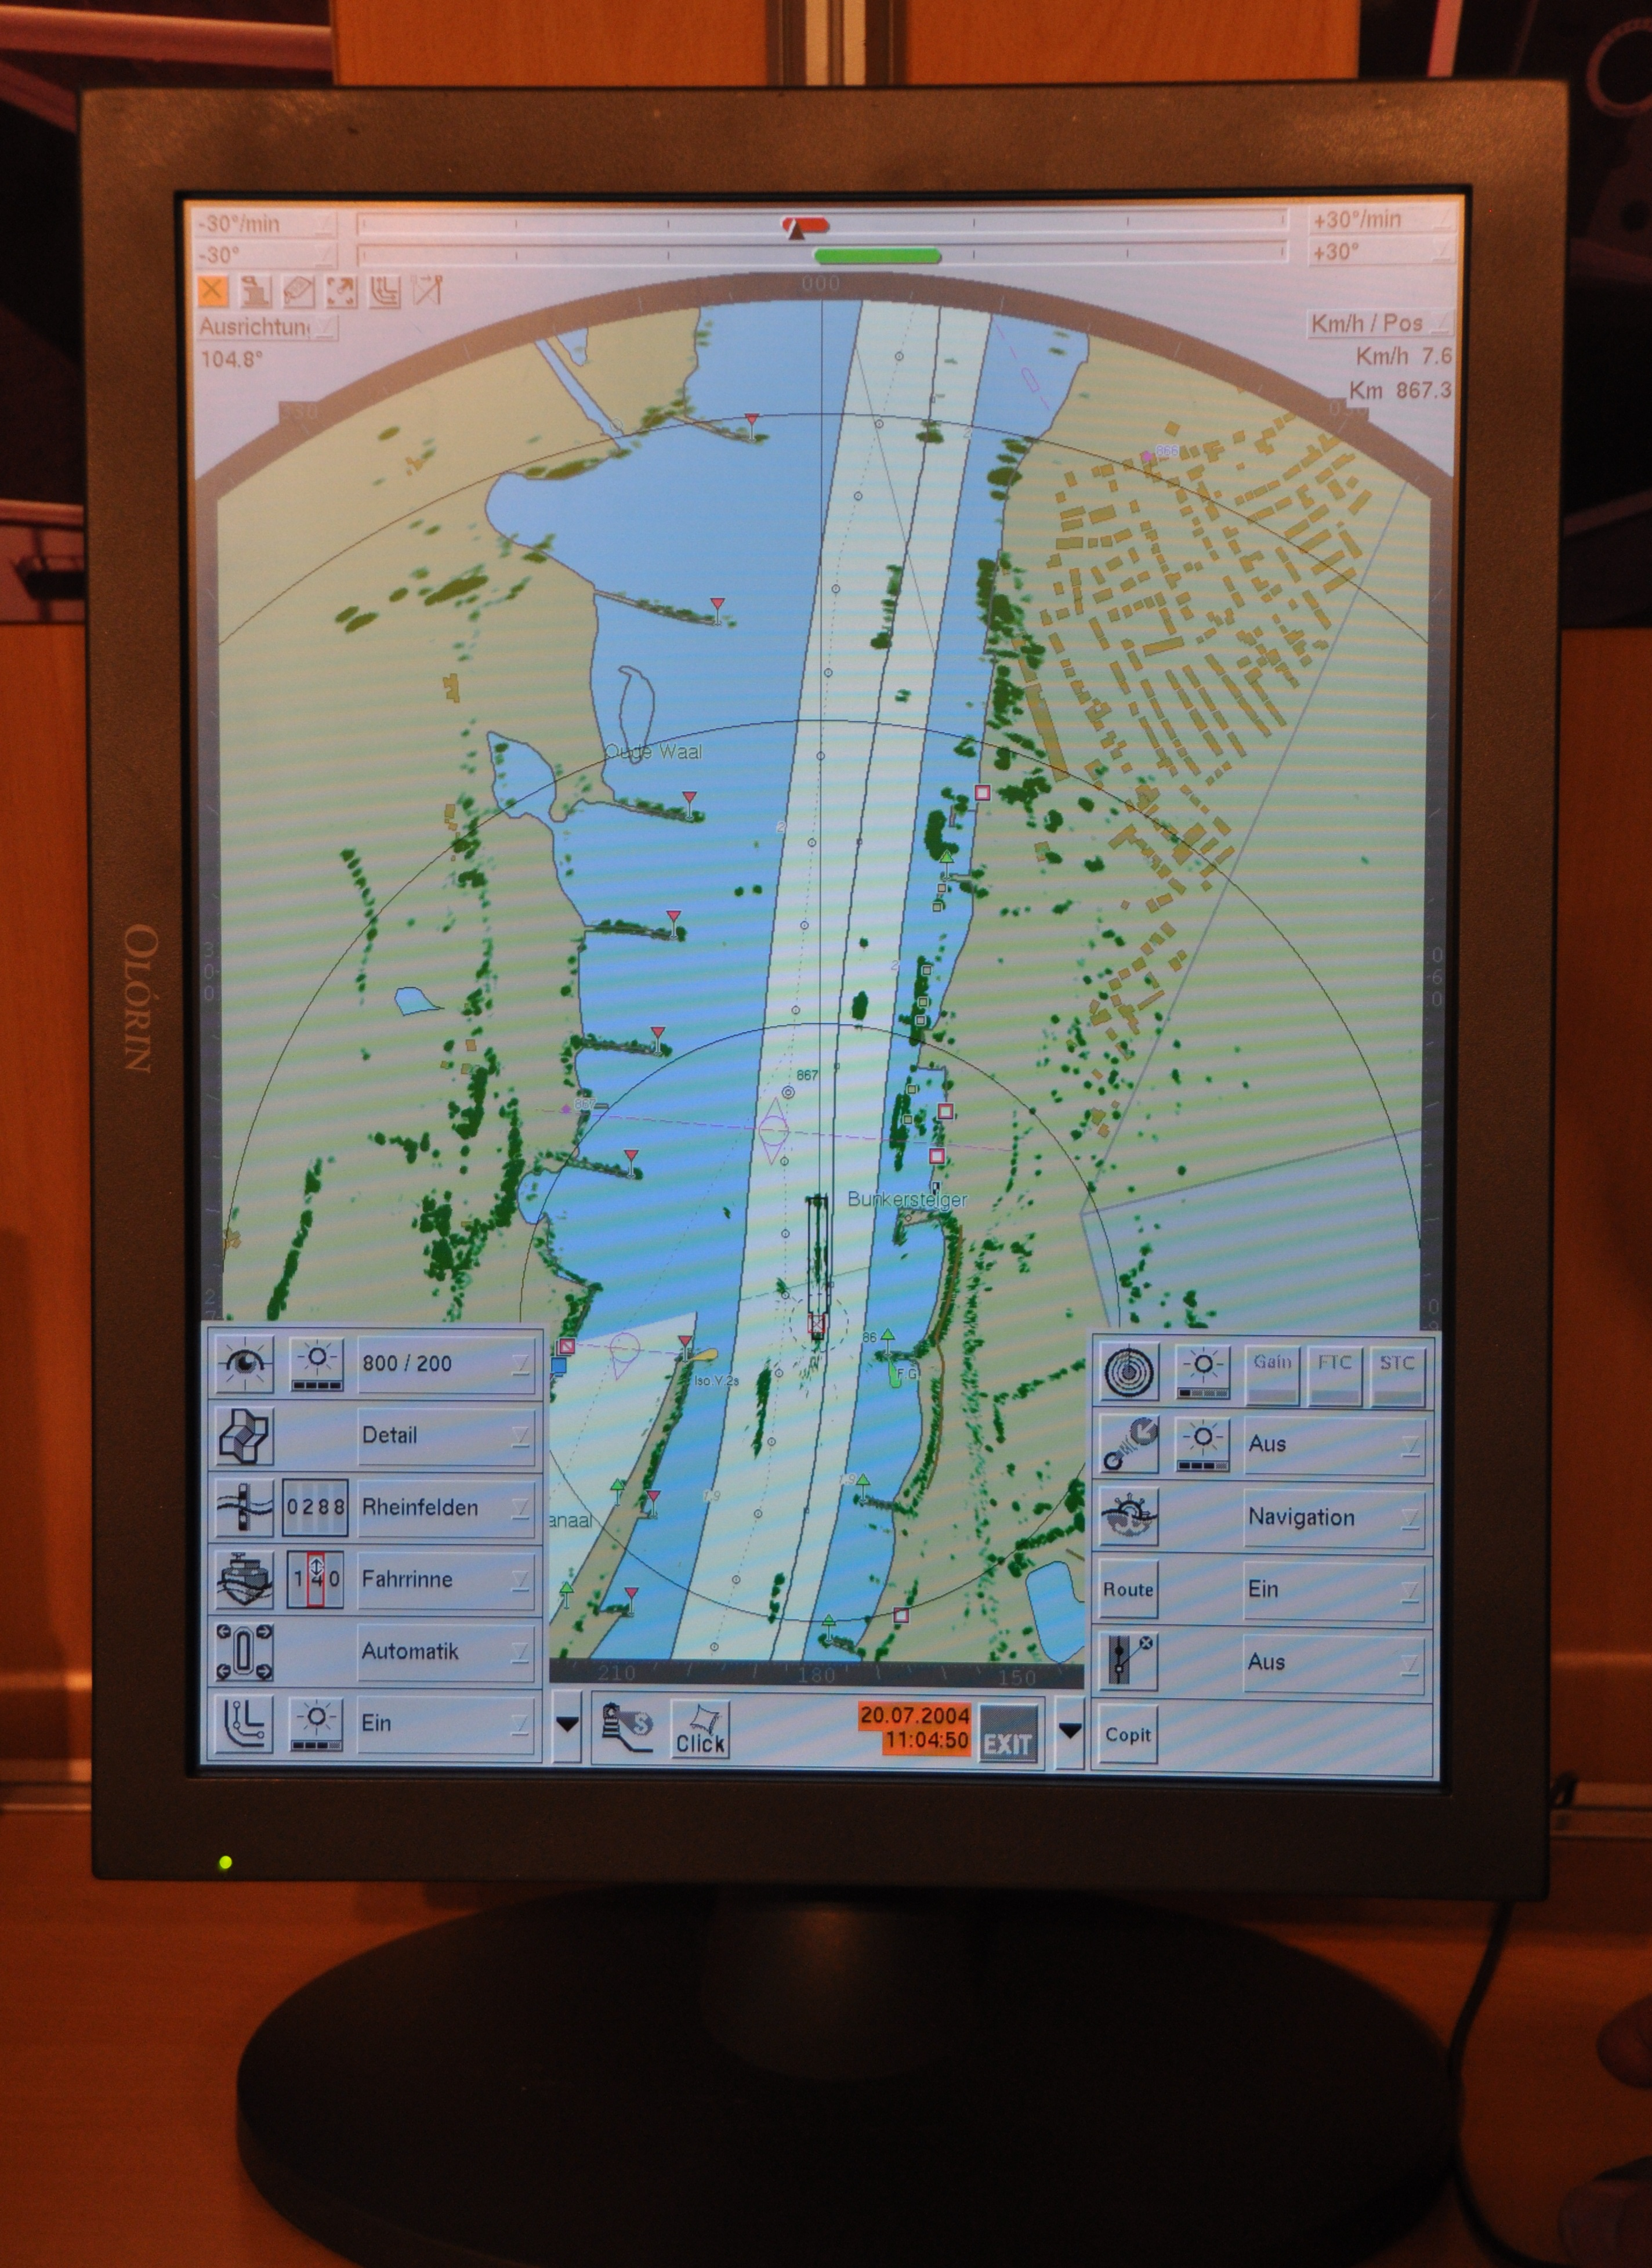 Charts In Powerpoint 2010: Electronic nautical chart of Radar Pilot 720º.JPG - Wikimedia ,Chart